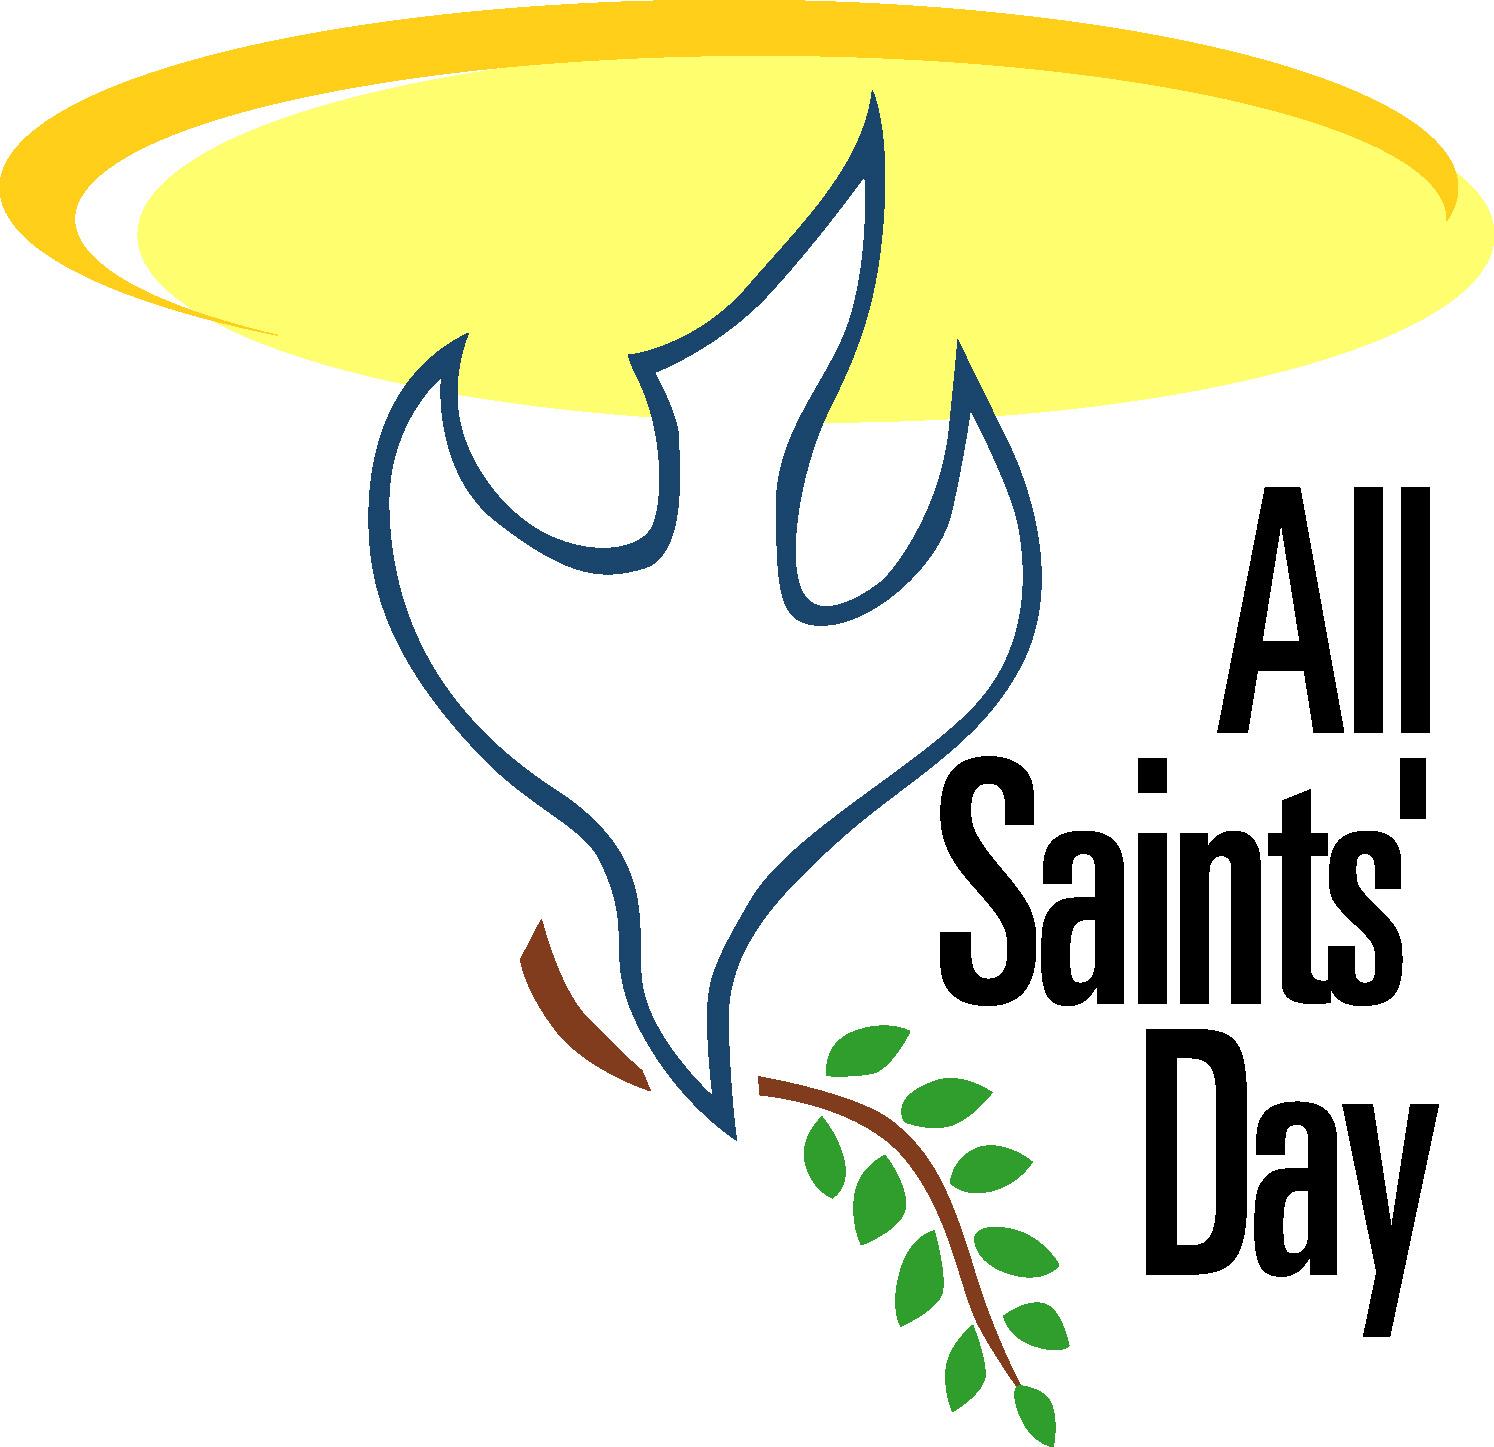 All Saints Day Clipart - ClipArt Best